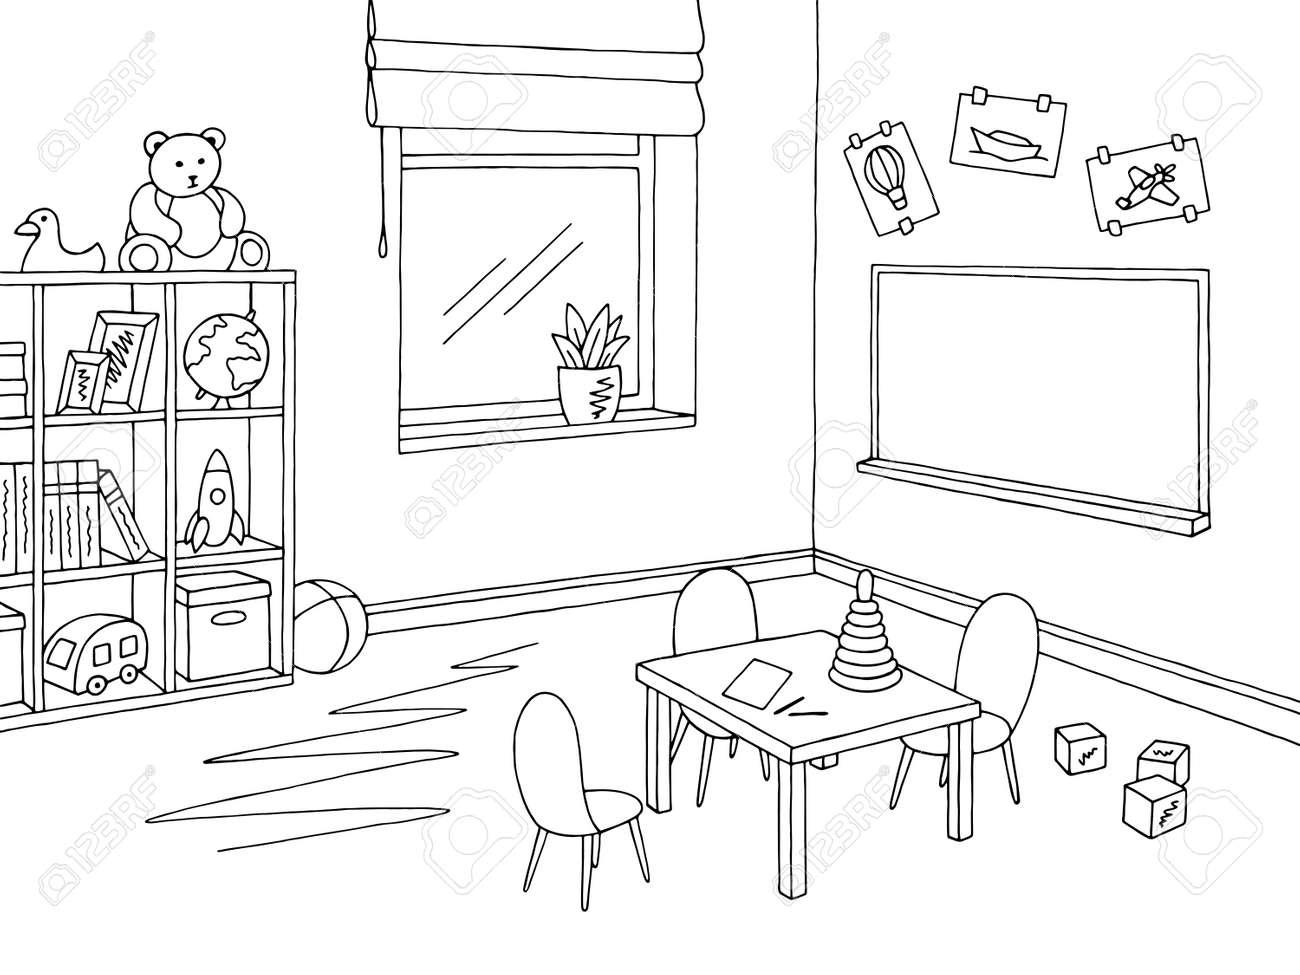 preschool classroom graphic black and white interior sketch